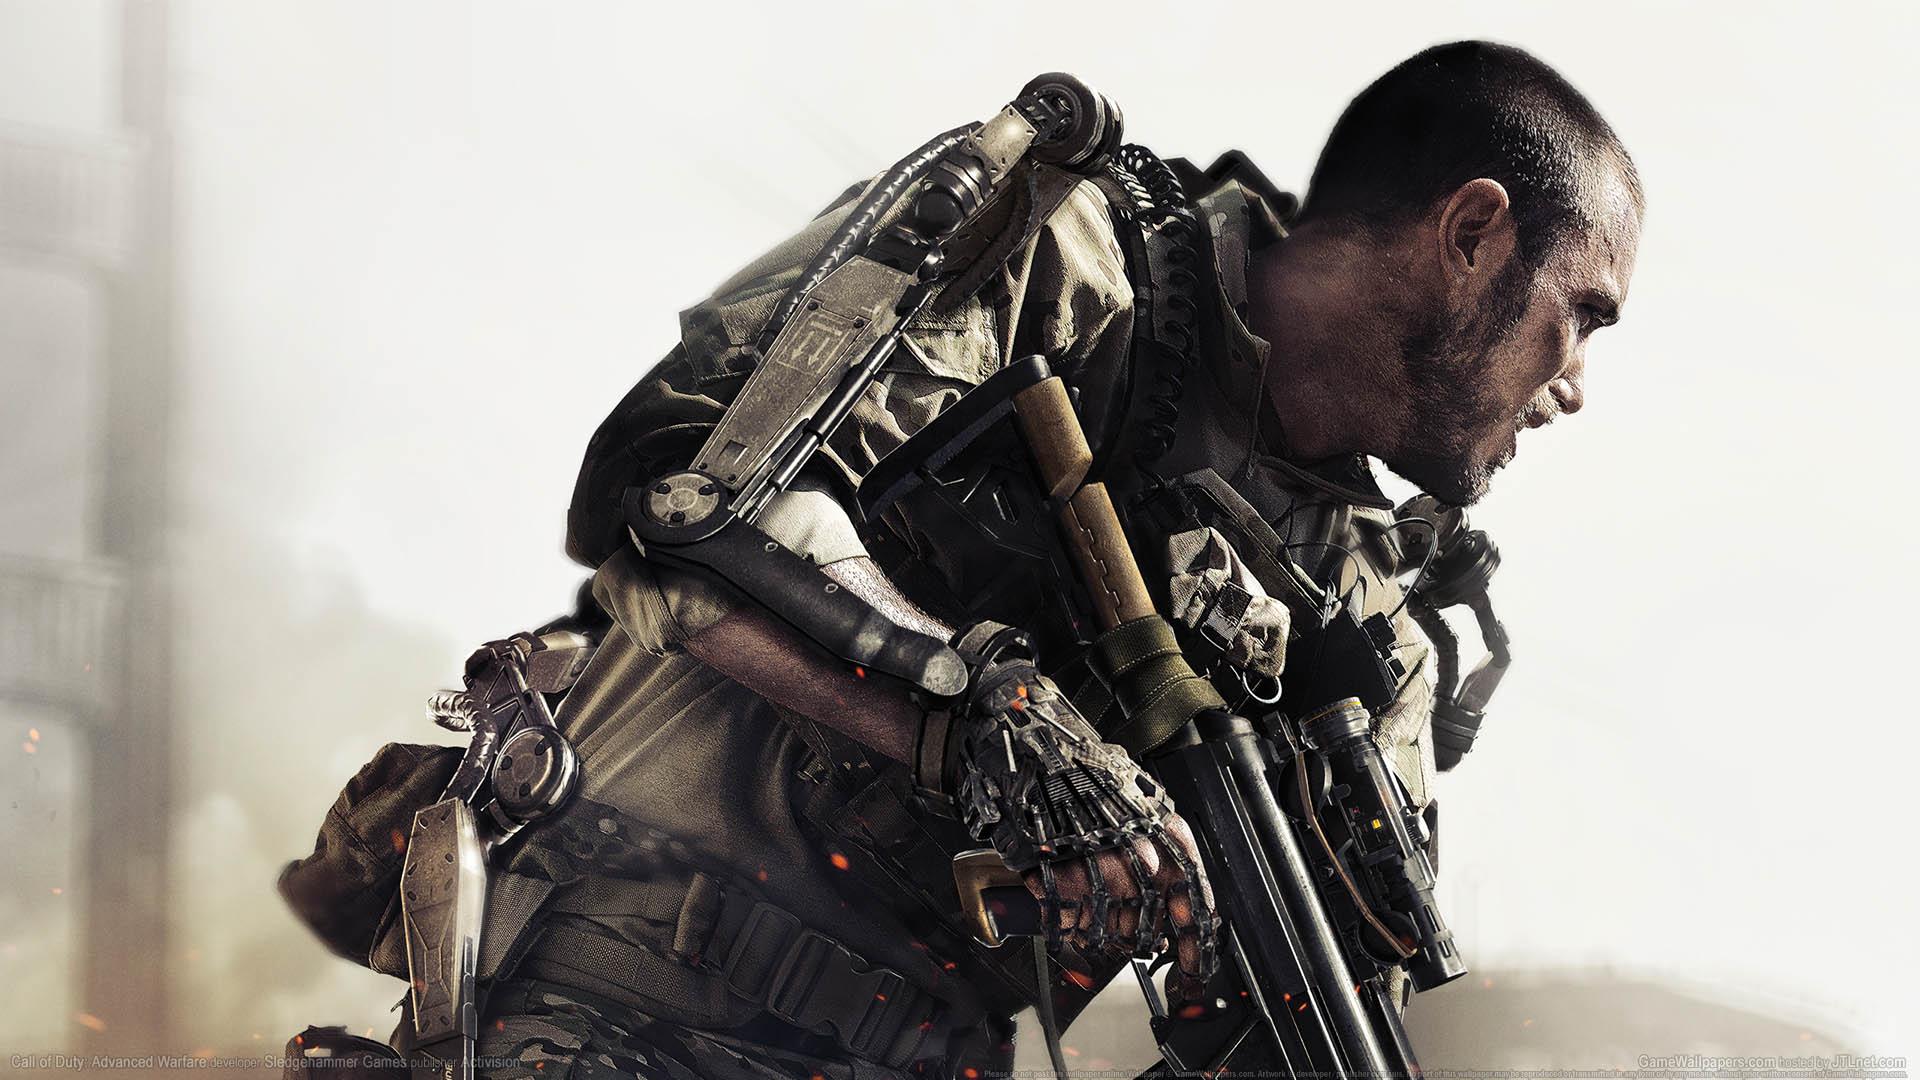 Call Of Duty Advanced Warfare Wallpaper 01 1920x1080